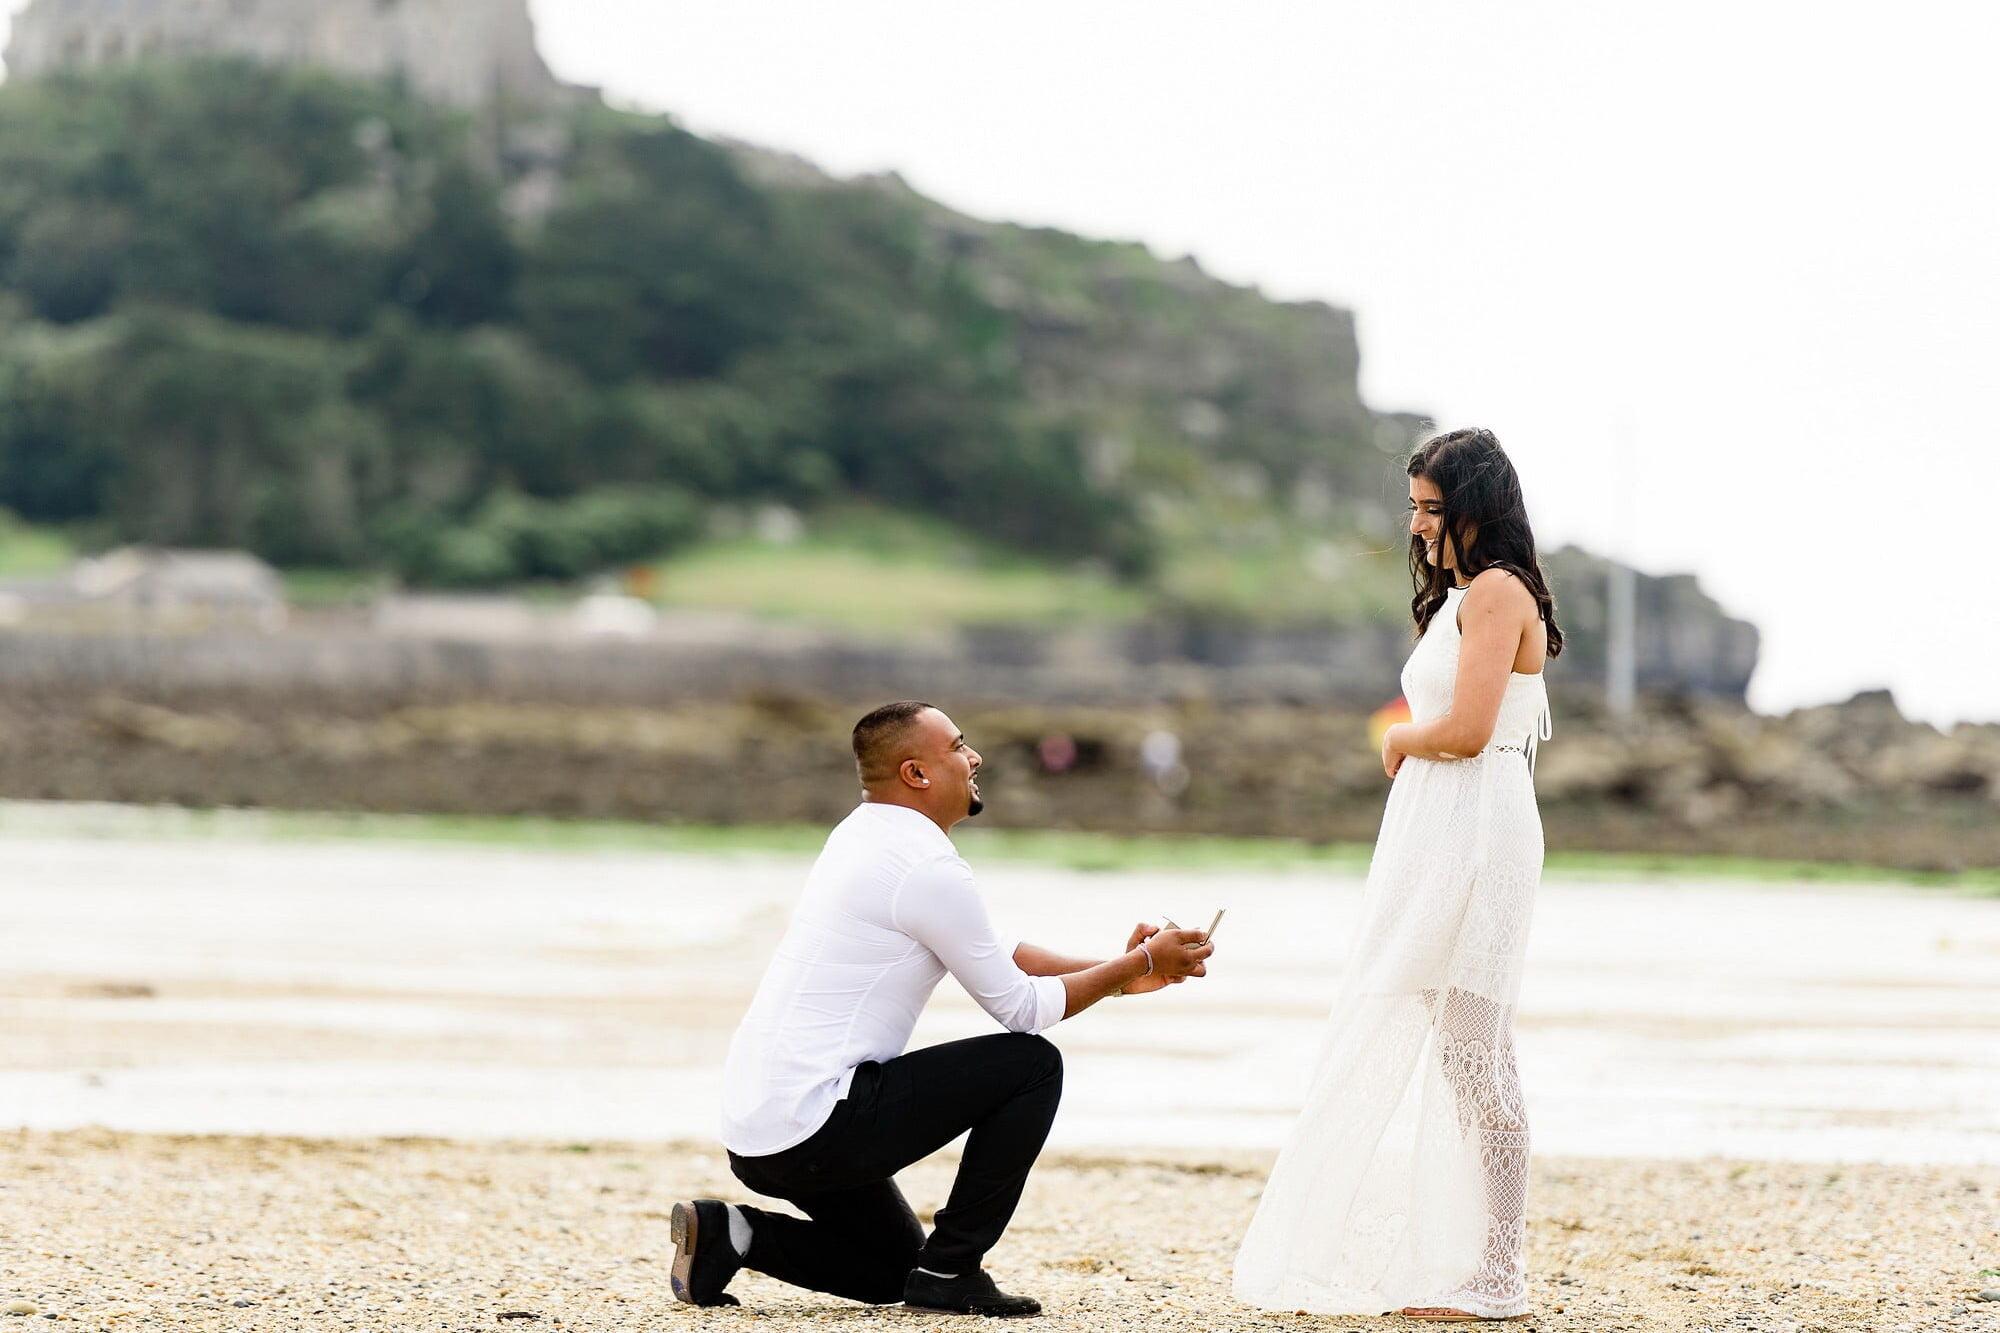 st michaels mount wedding proposal 11